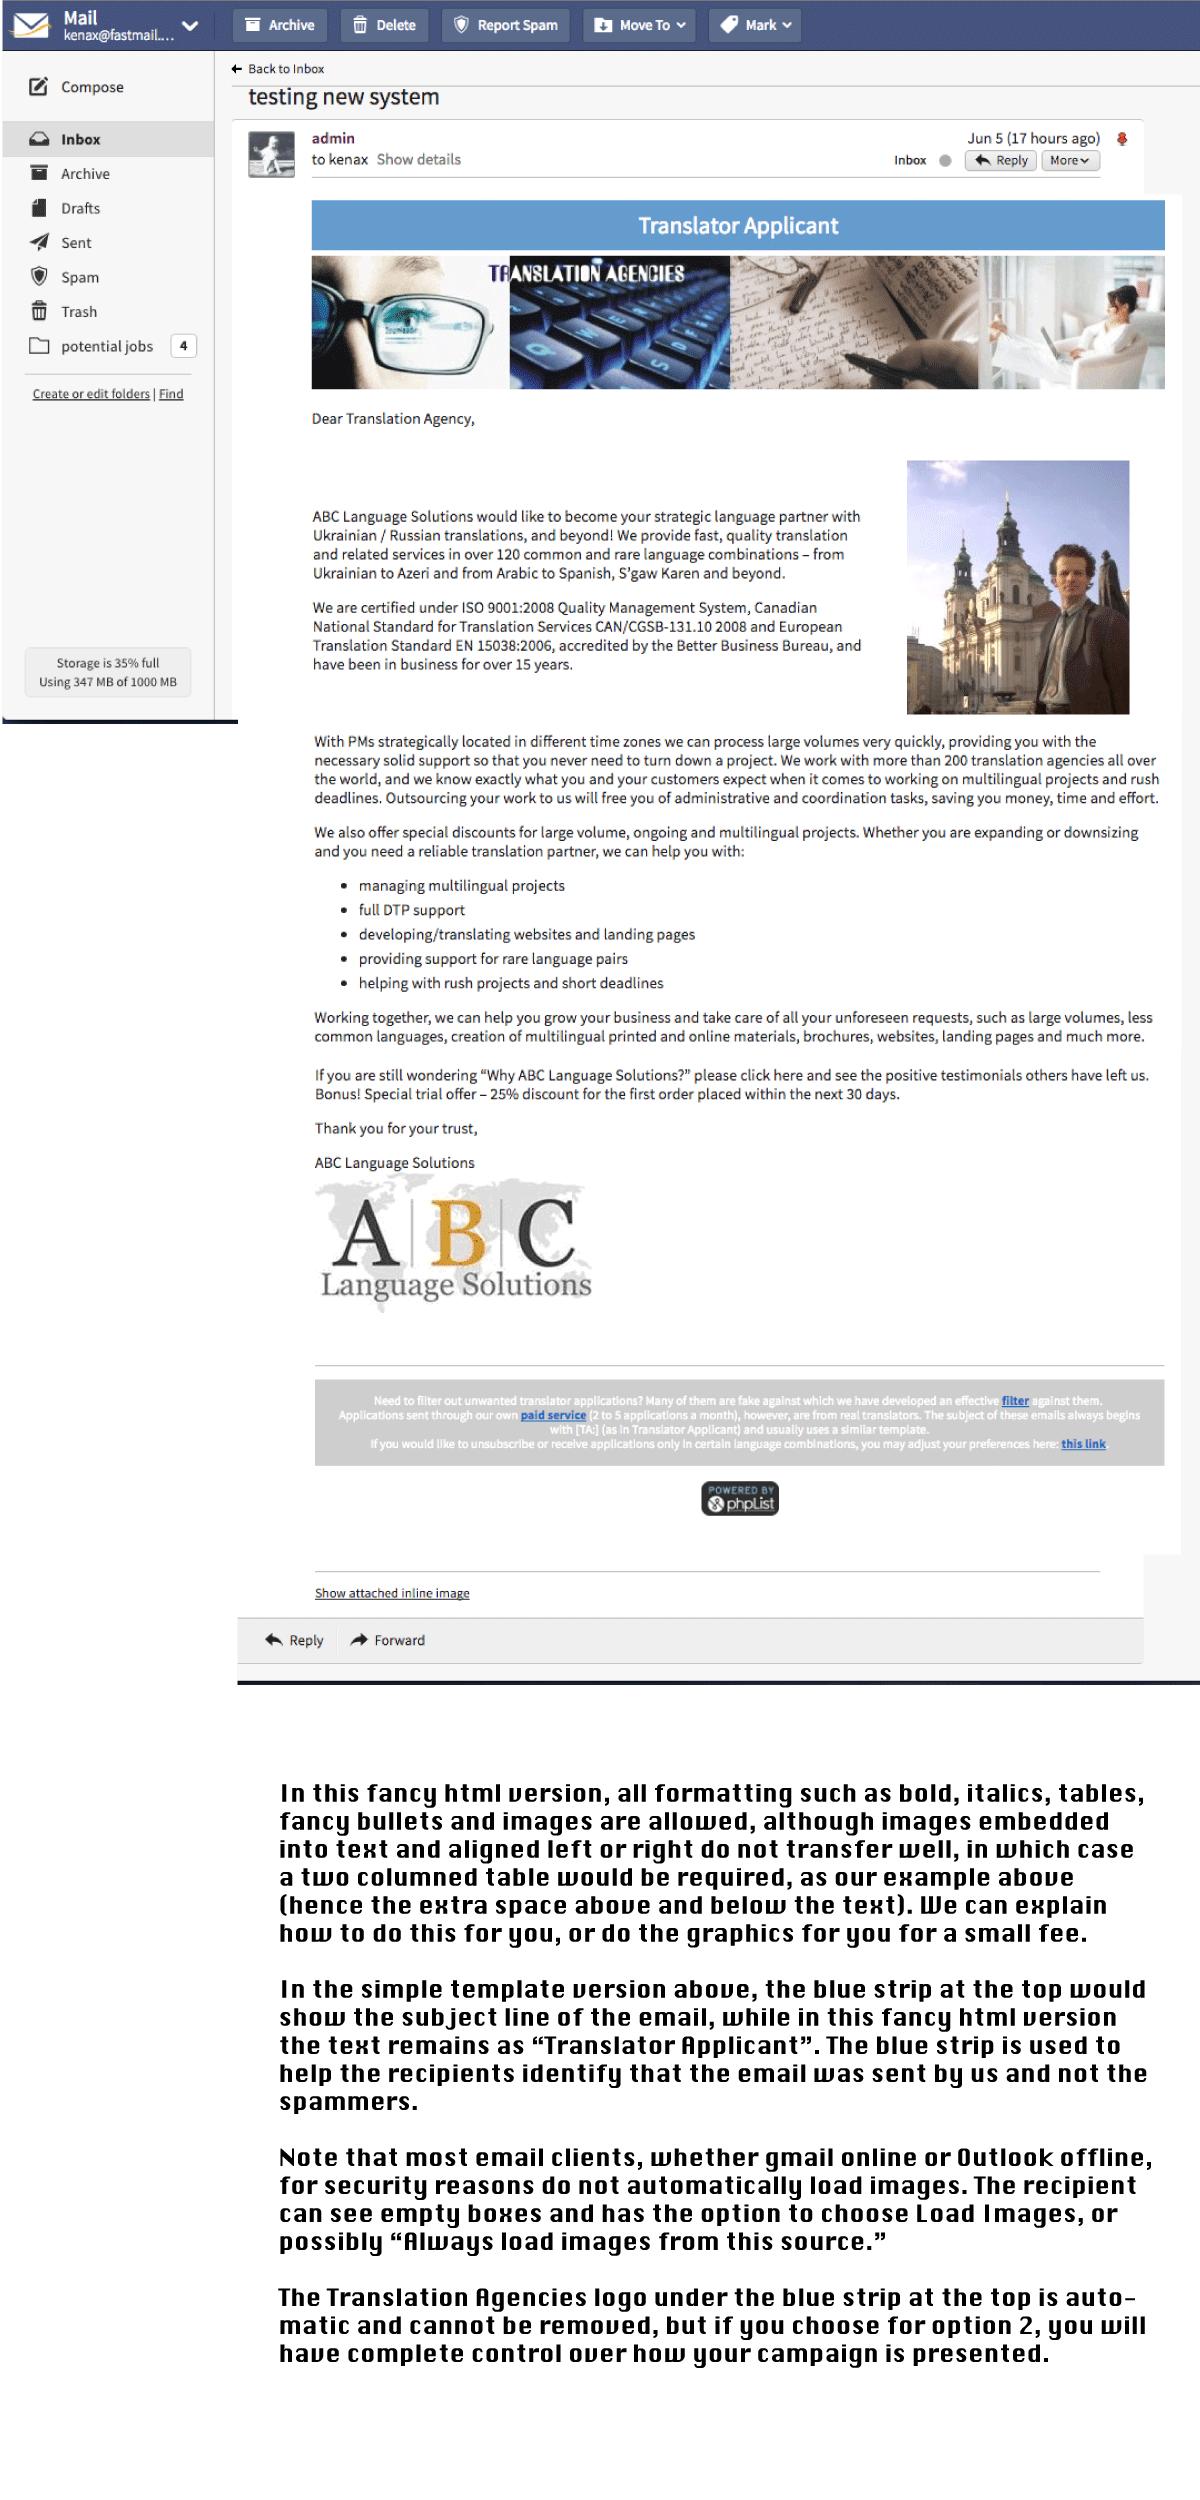 translation-work-jobs-email-sample-fancy-html